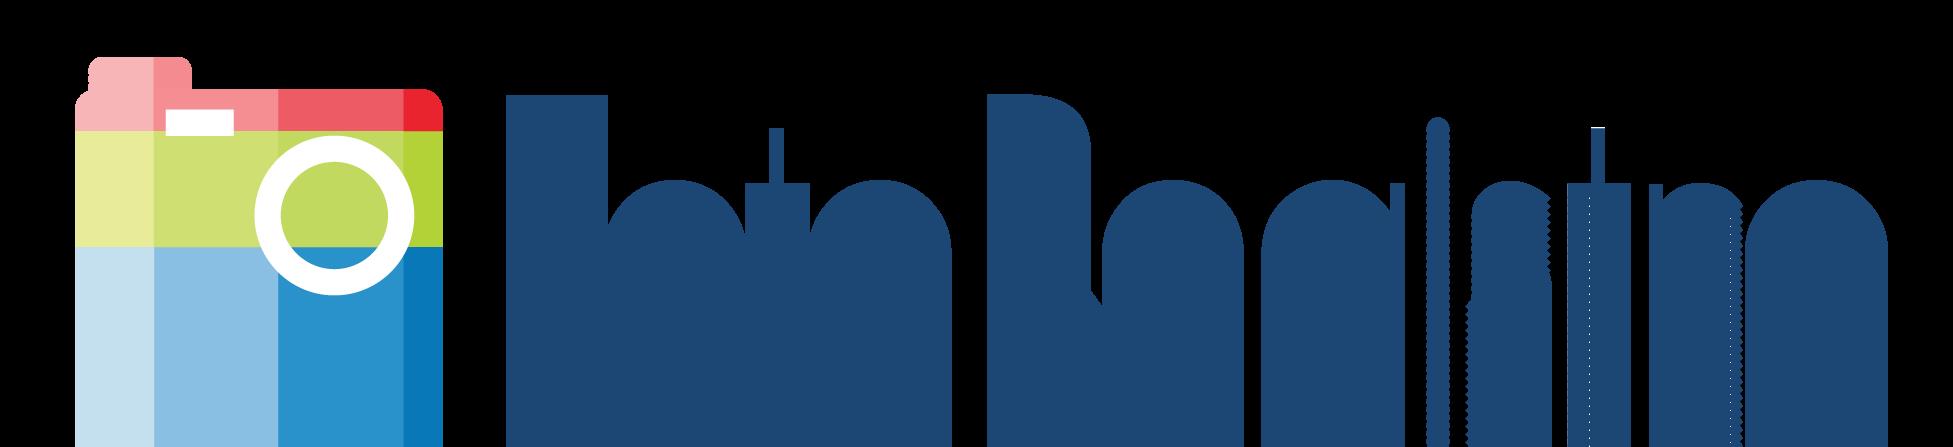 Logo_FotoRegistro_02